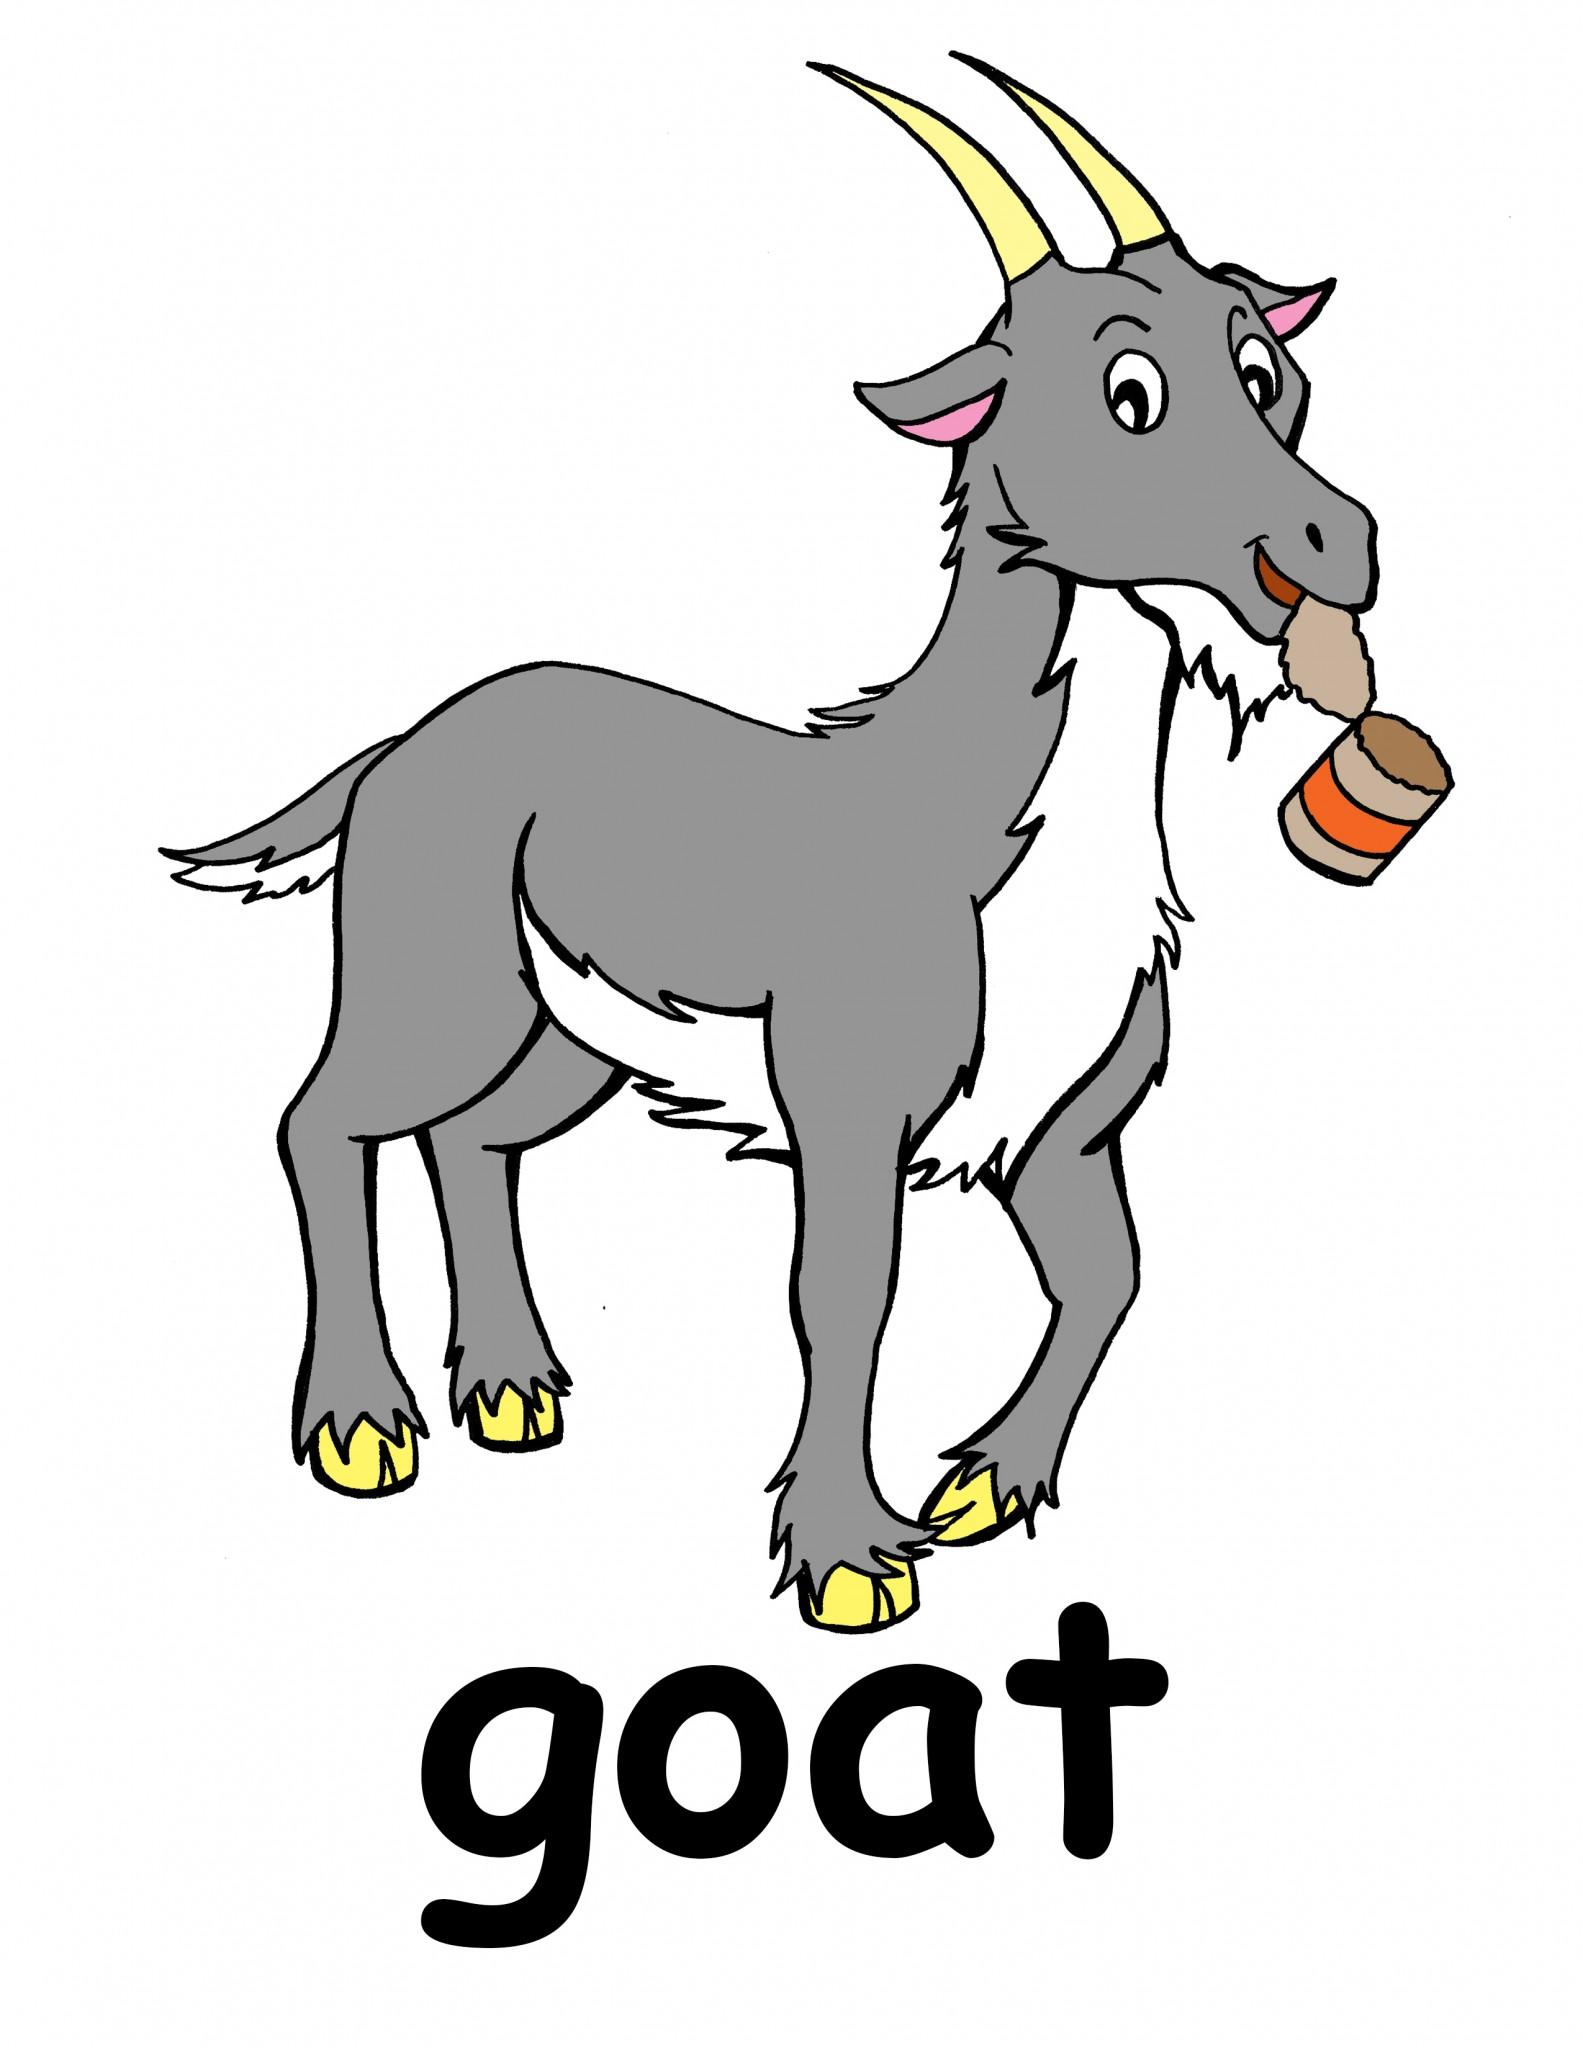 Clip art goat clipart collection.